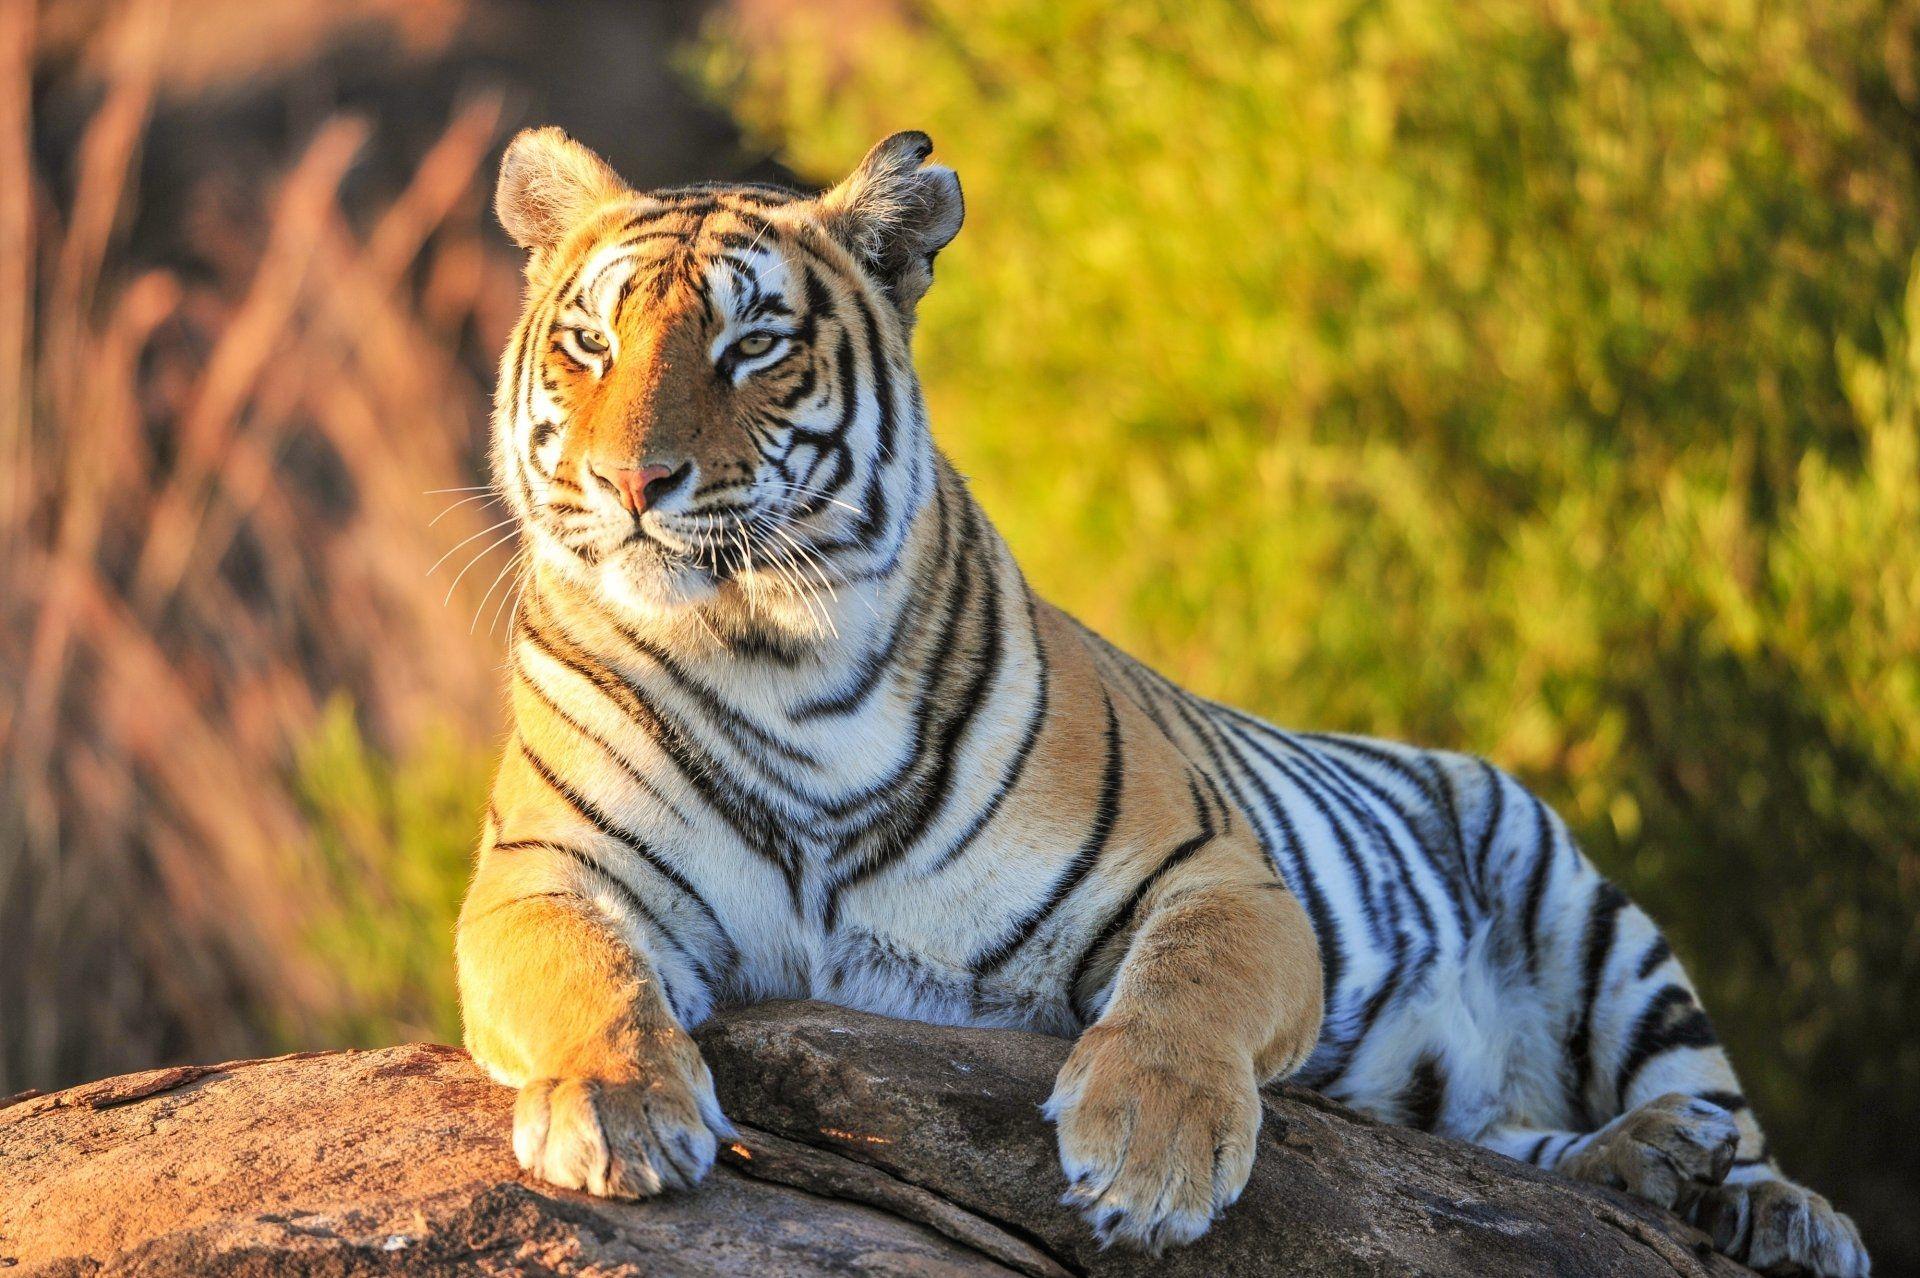 Tiger, Cool HD Wallpaper